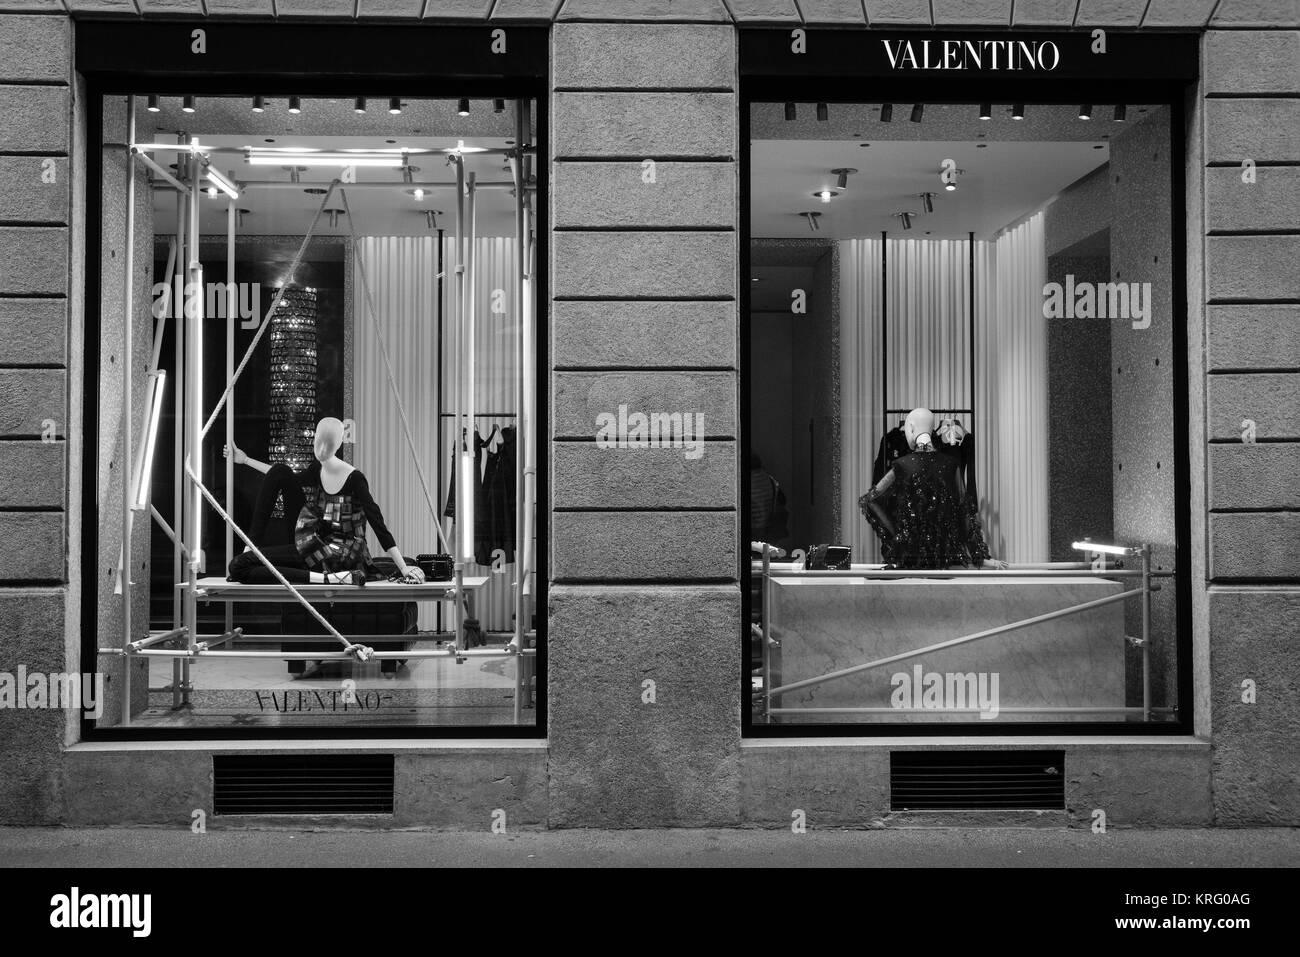 Valentino Logo Stock Photos & Valentino Logo Stock Images - Alamy